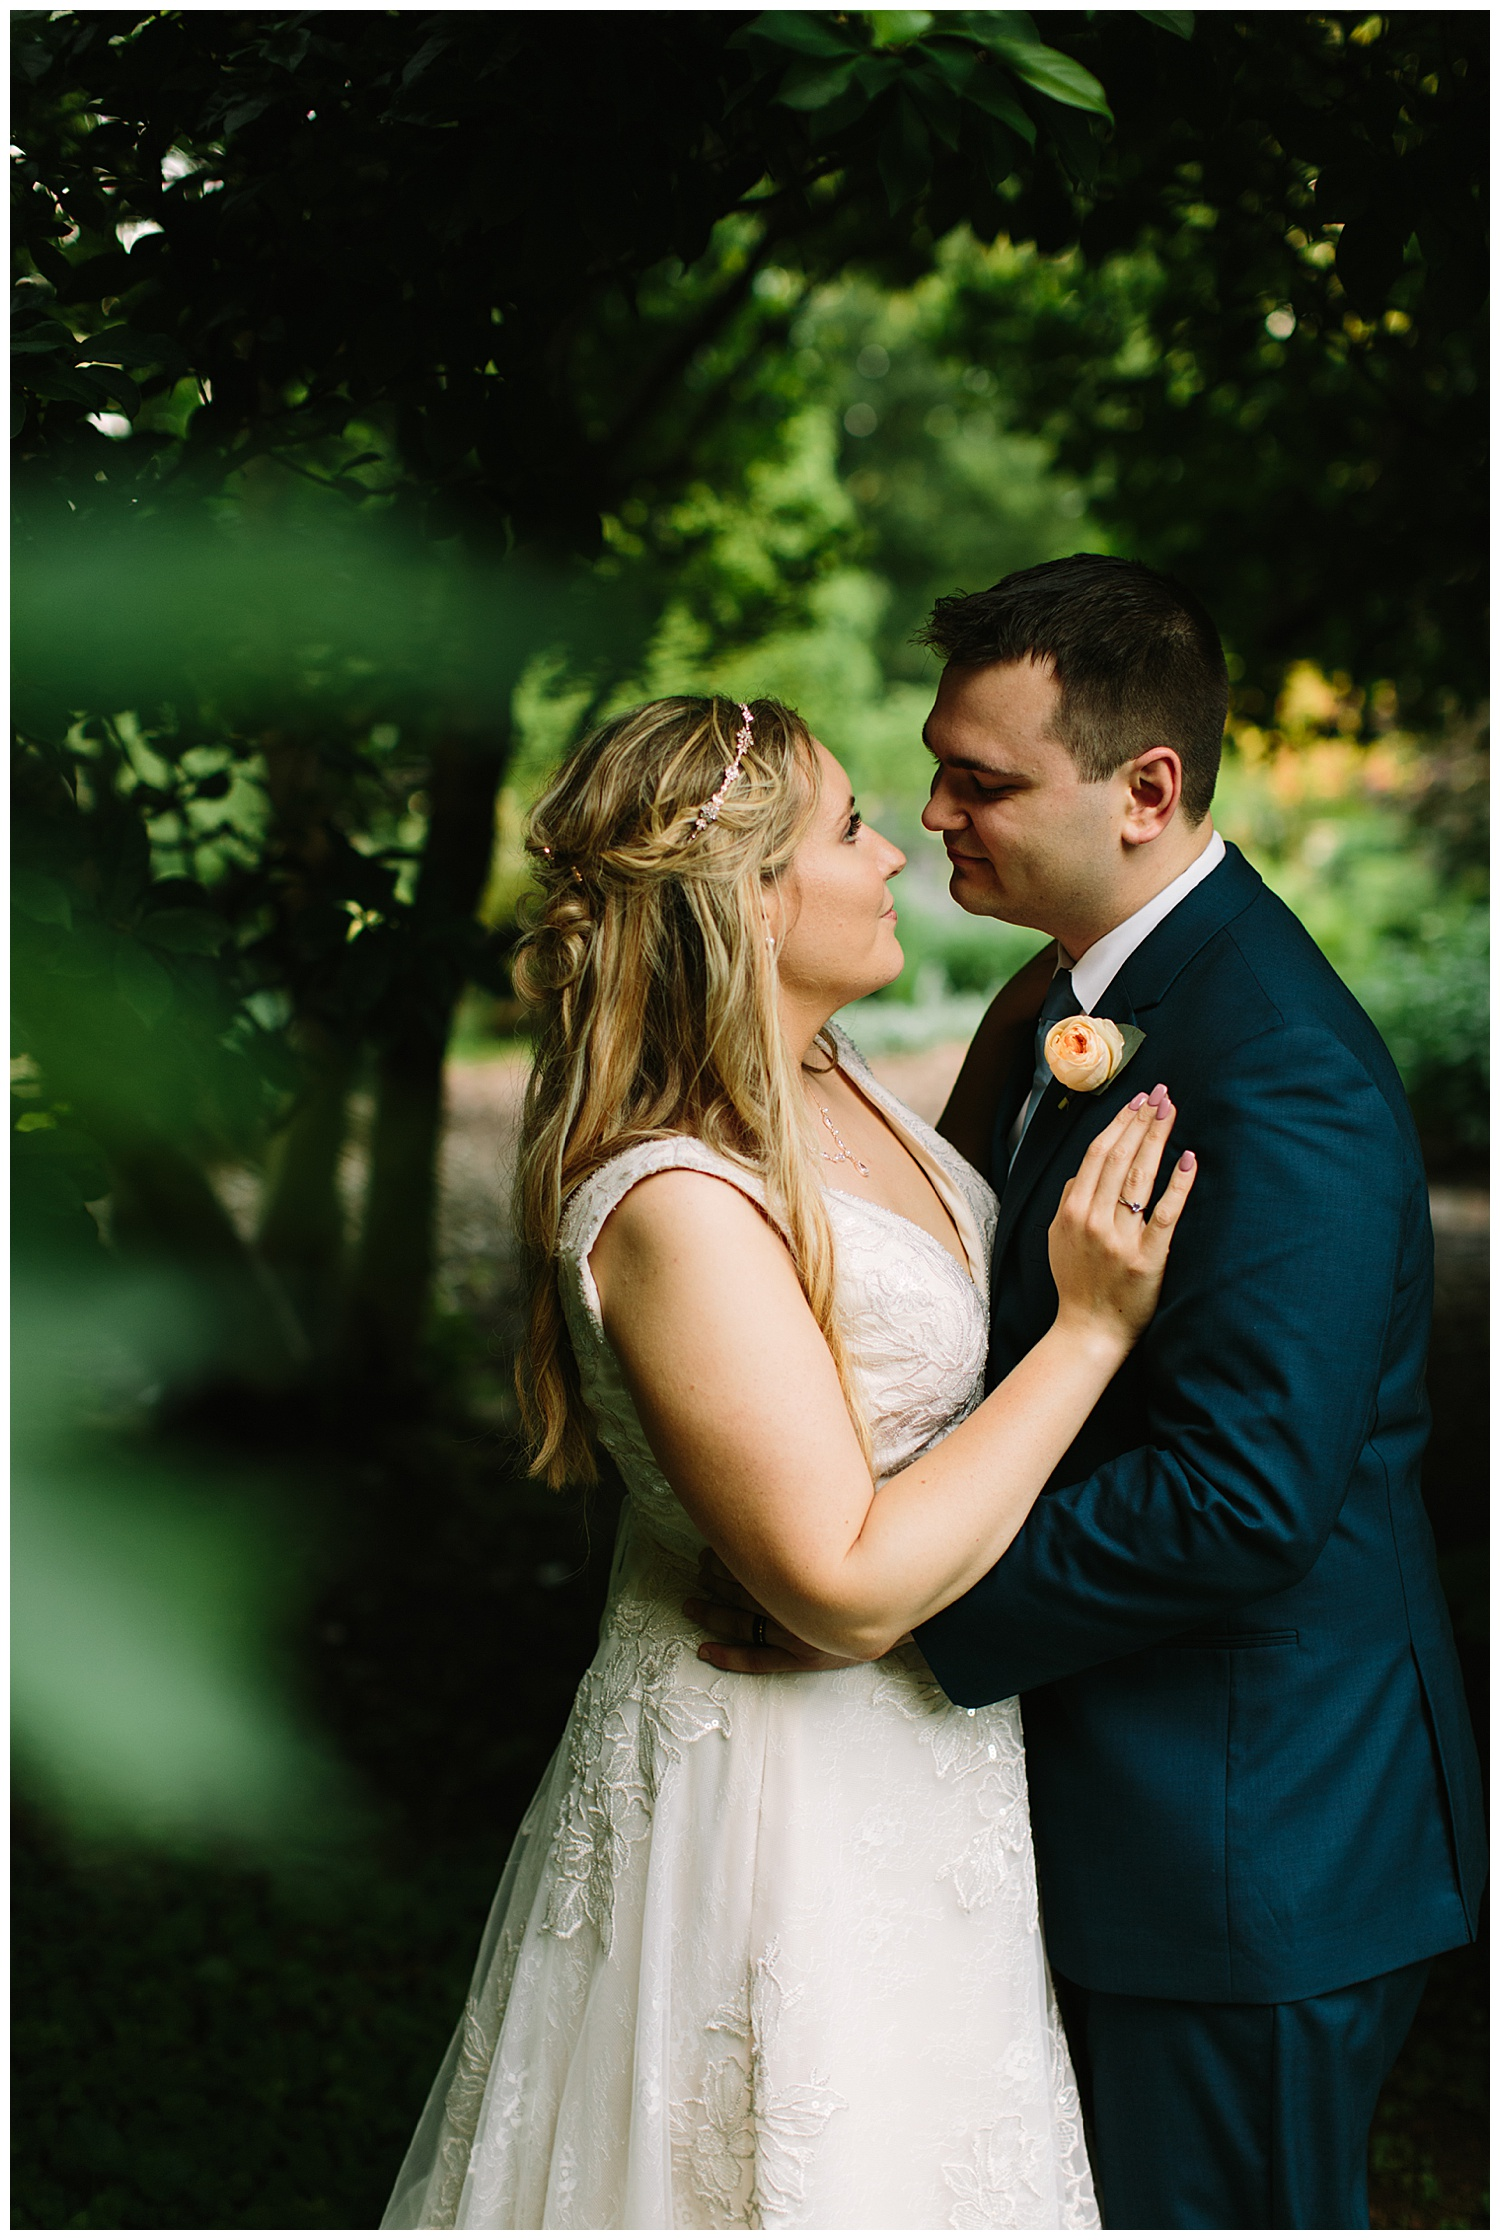 trent.and.kendra.photography.whitehall.wedding-155.jpg